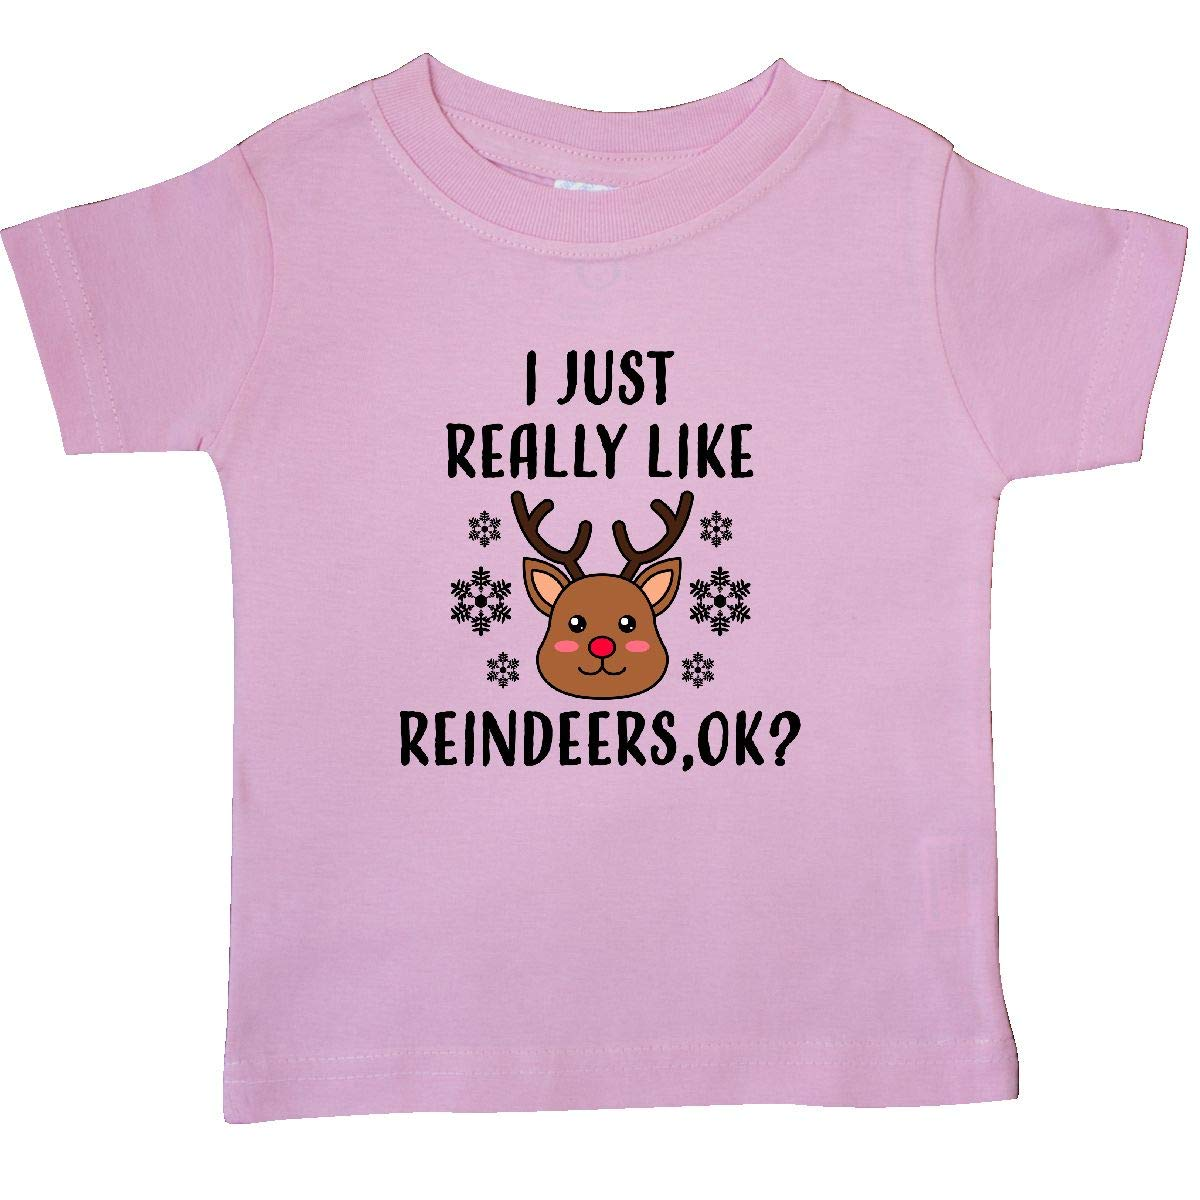 inktastic I Just Really Like Reindeers Ok Baby T-Shirt